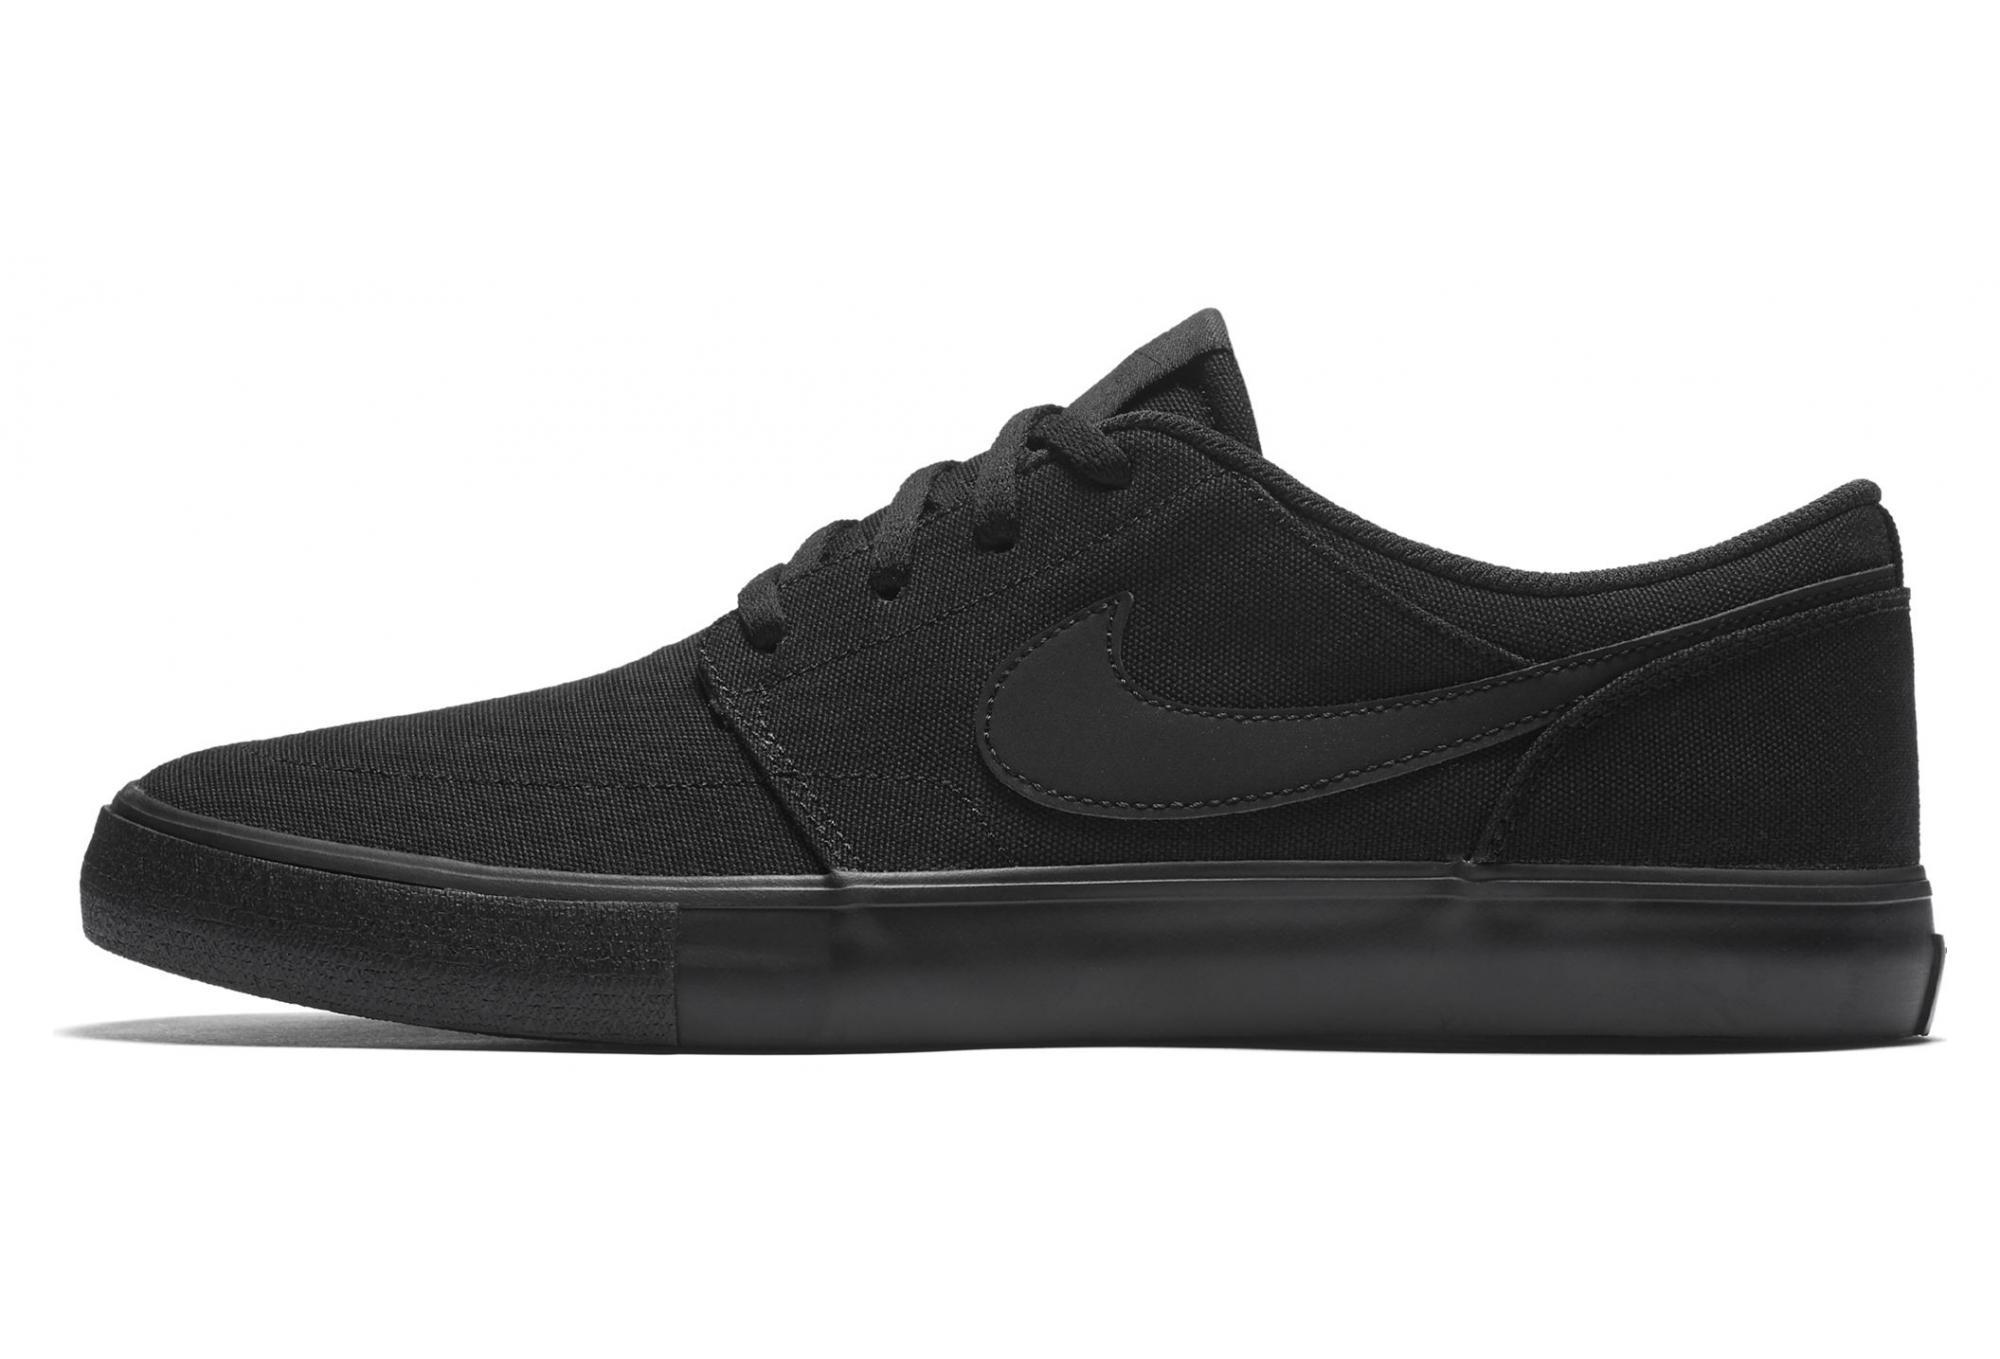 Nike SB Solarsoft Portmore II Shoes